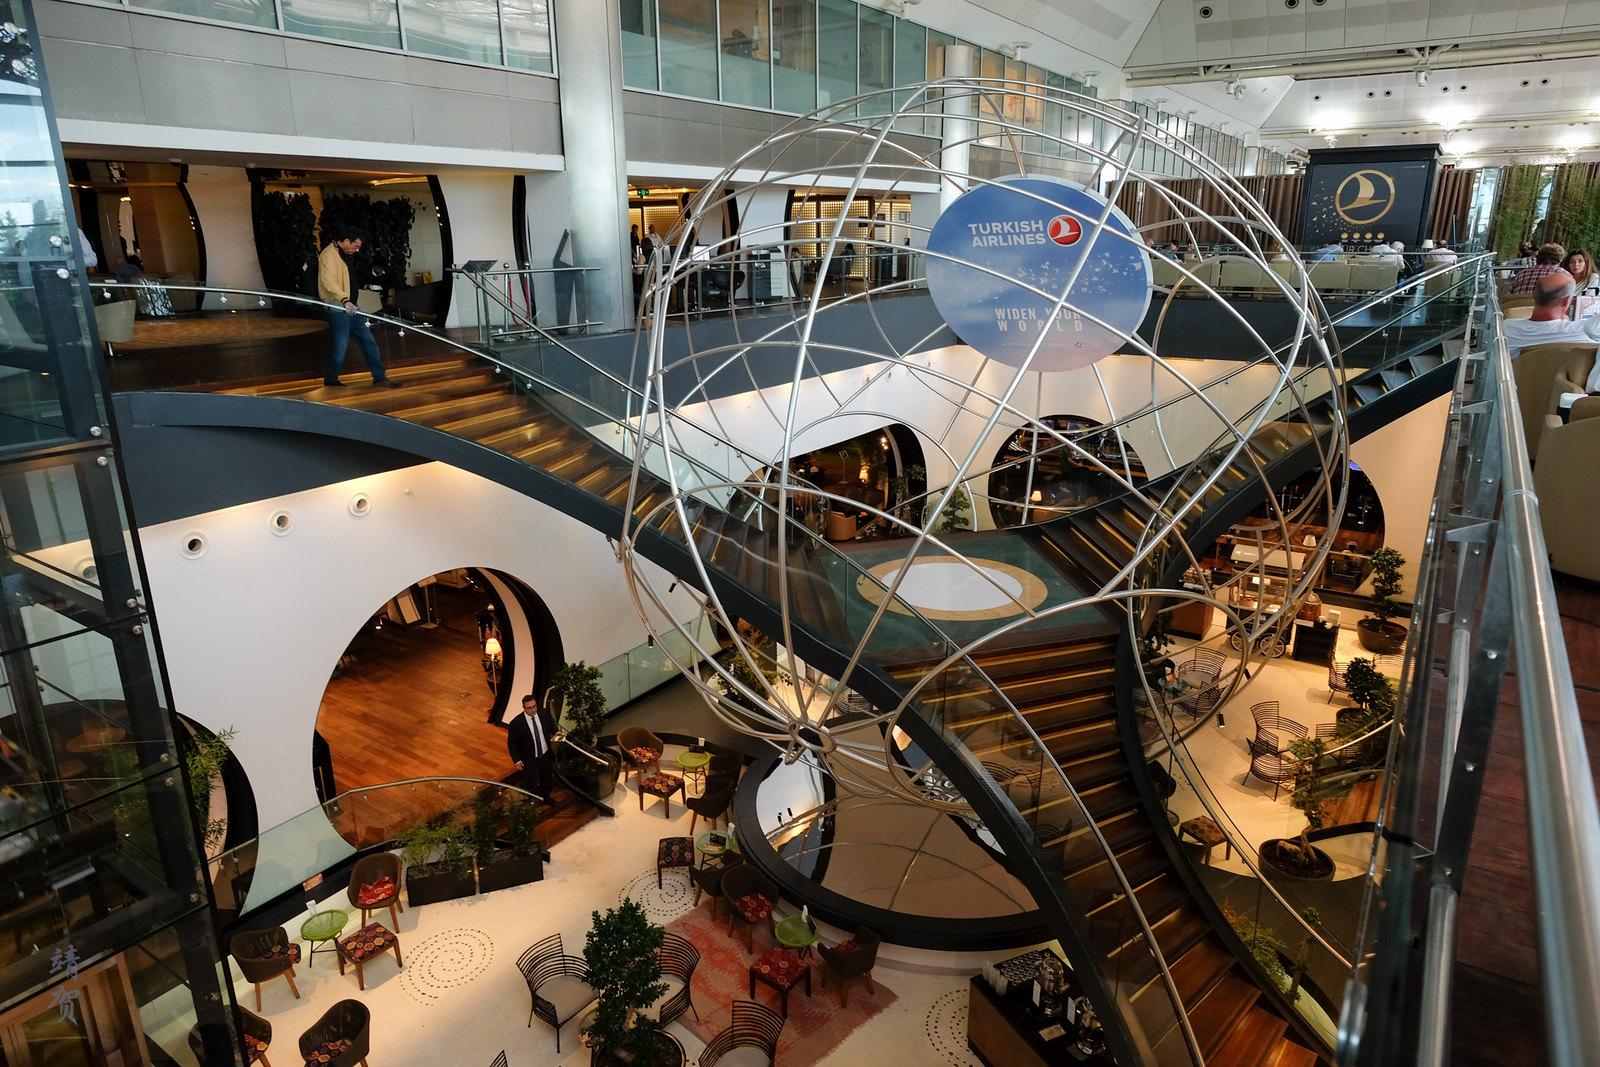 Centre atrium